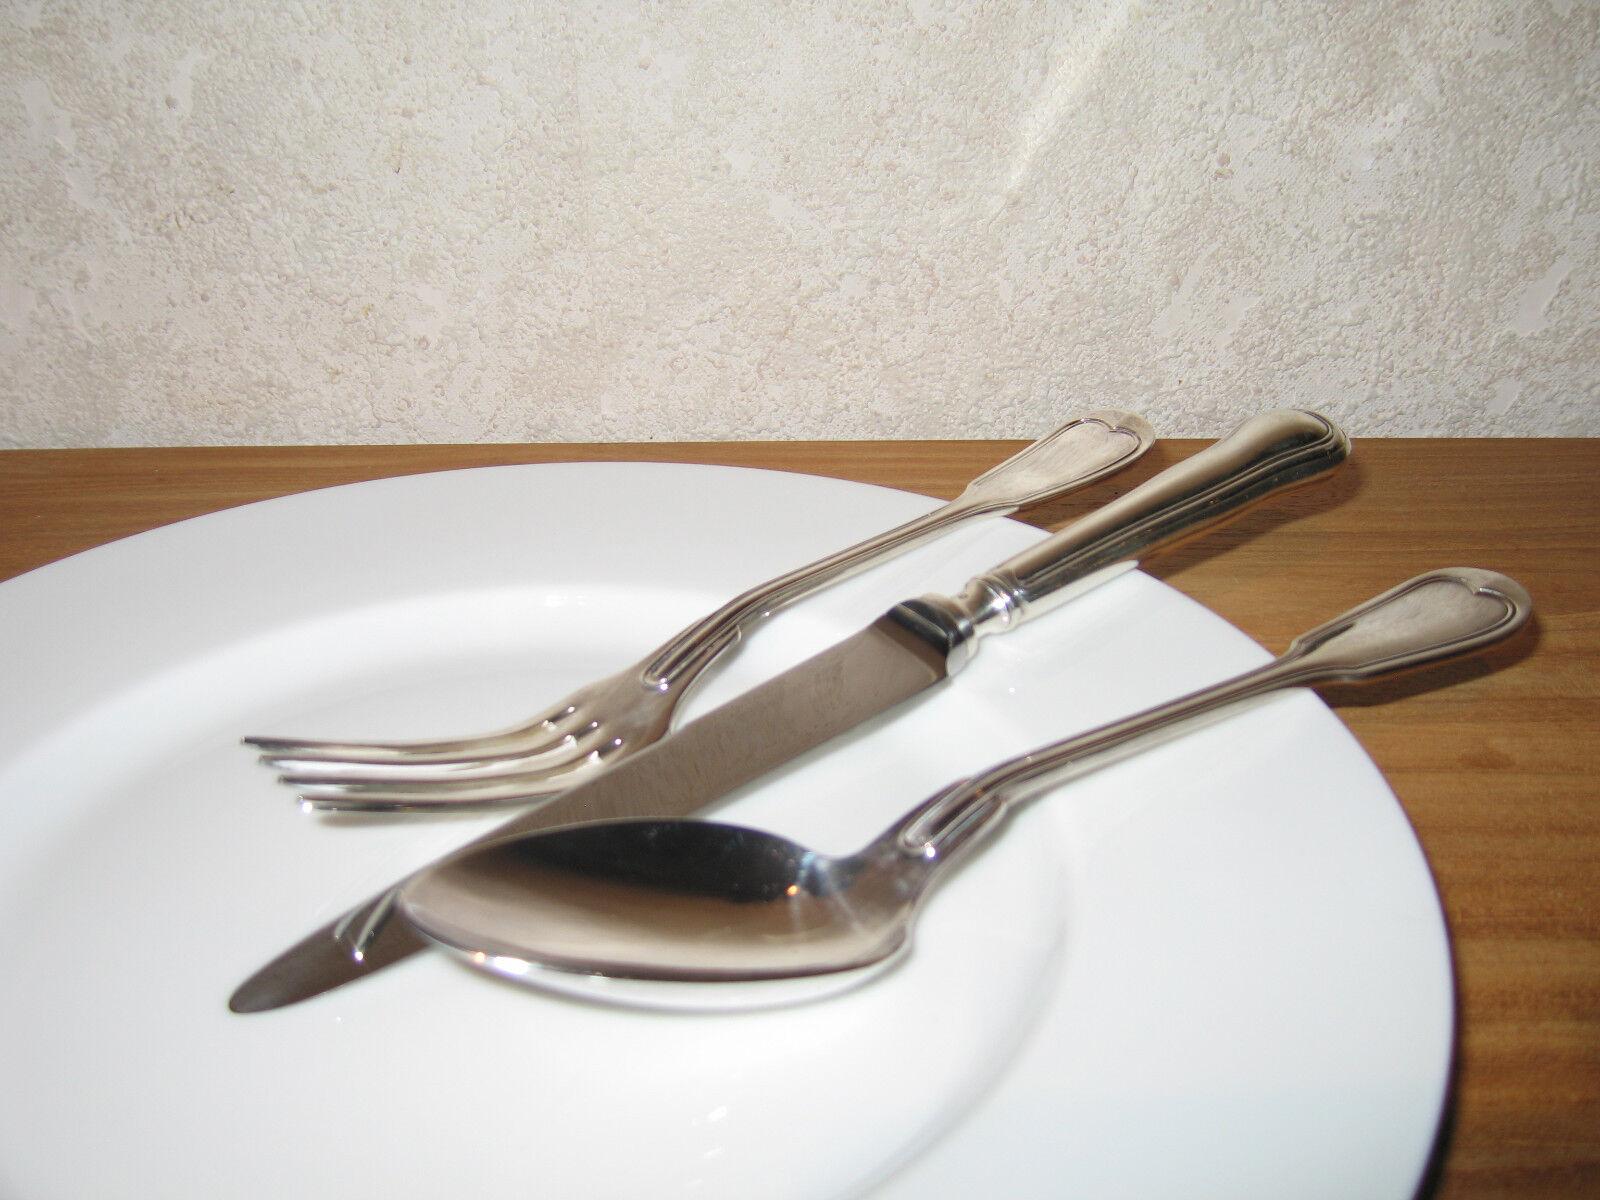 WISKEMANN NEW FILETS Set 3 couverts Cutlery Métal argenté 100g